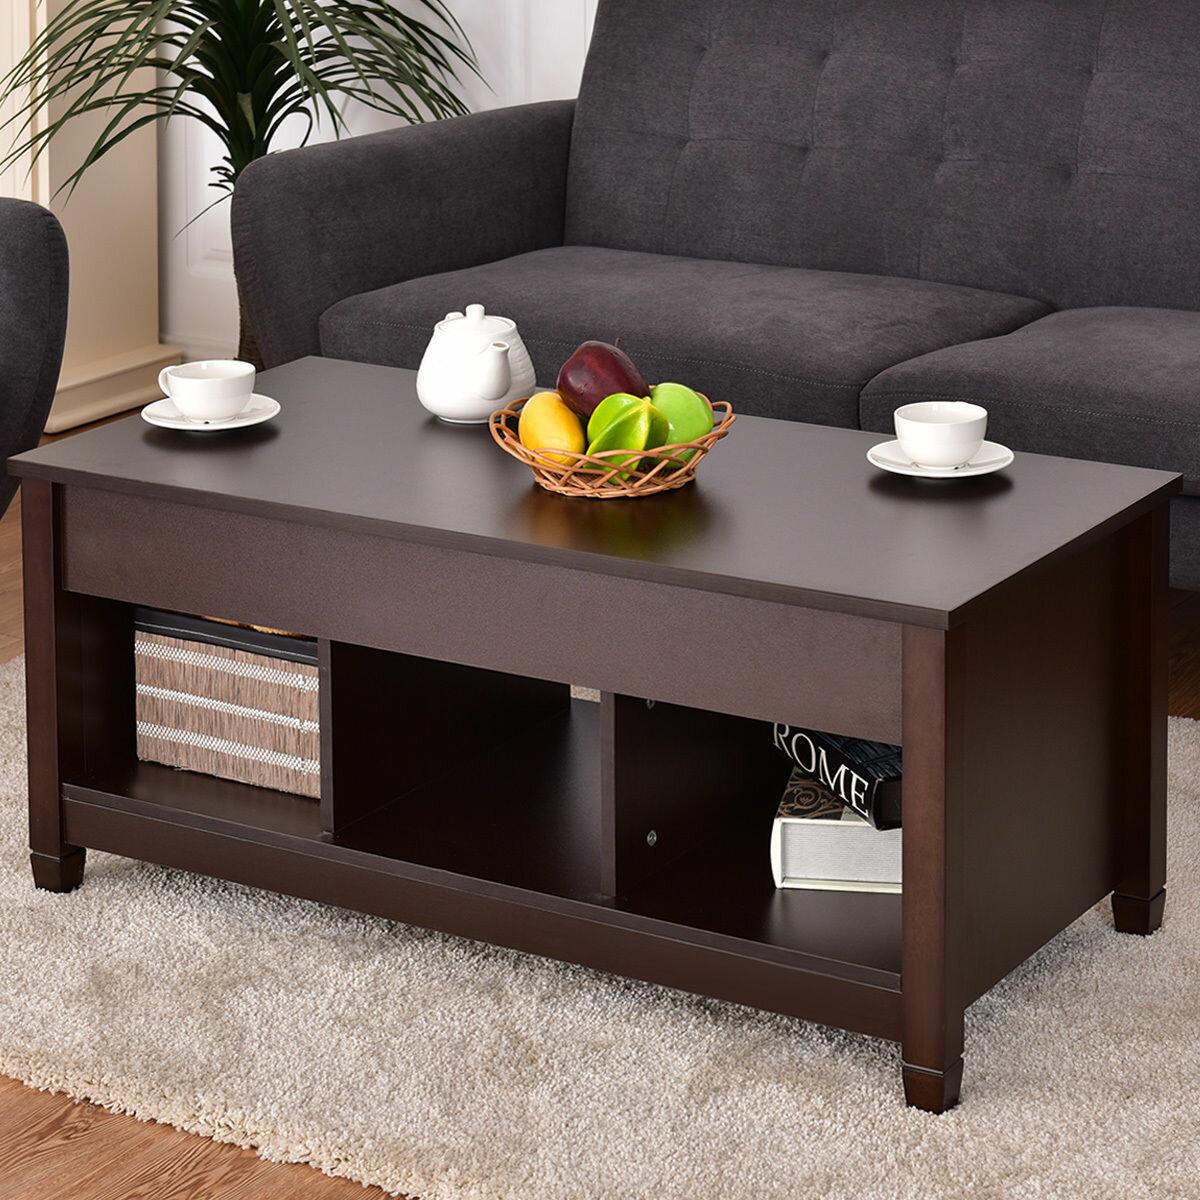 Highland dunes alaska lift top coffee table with storage reviews wayfair